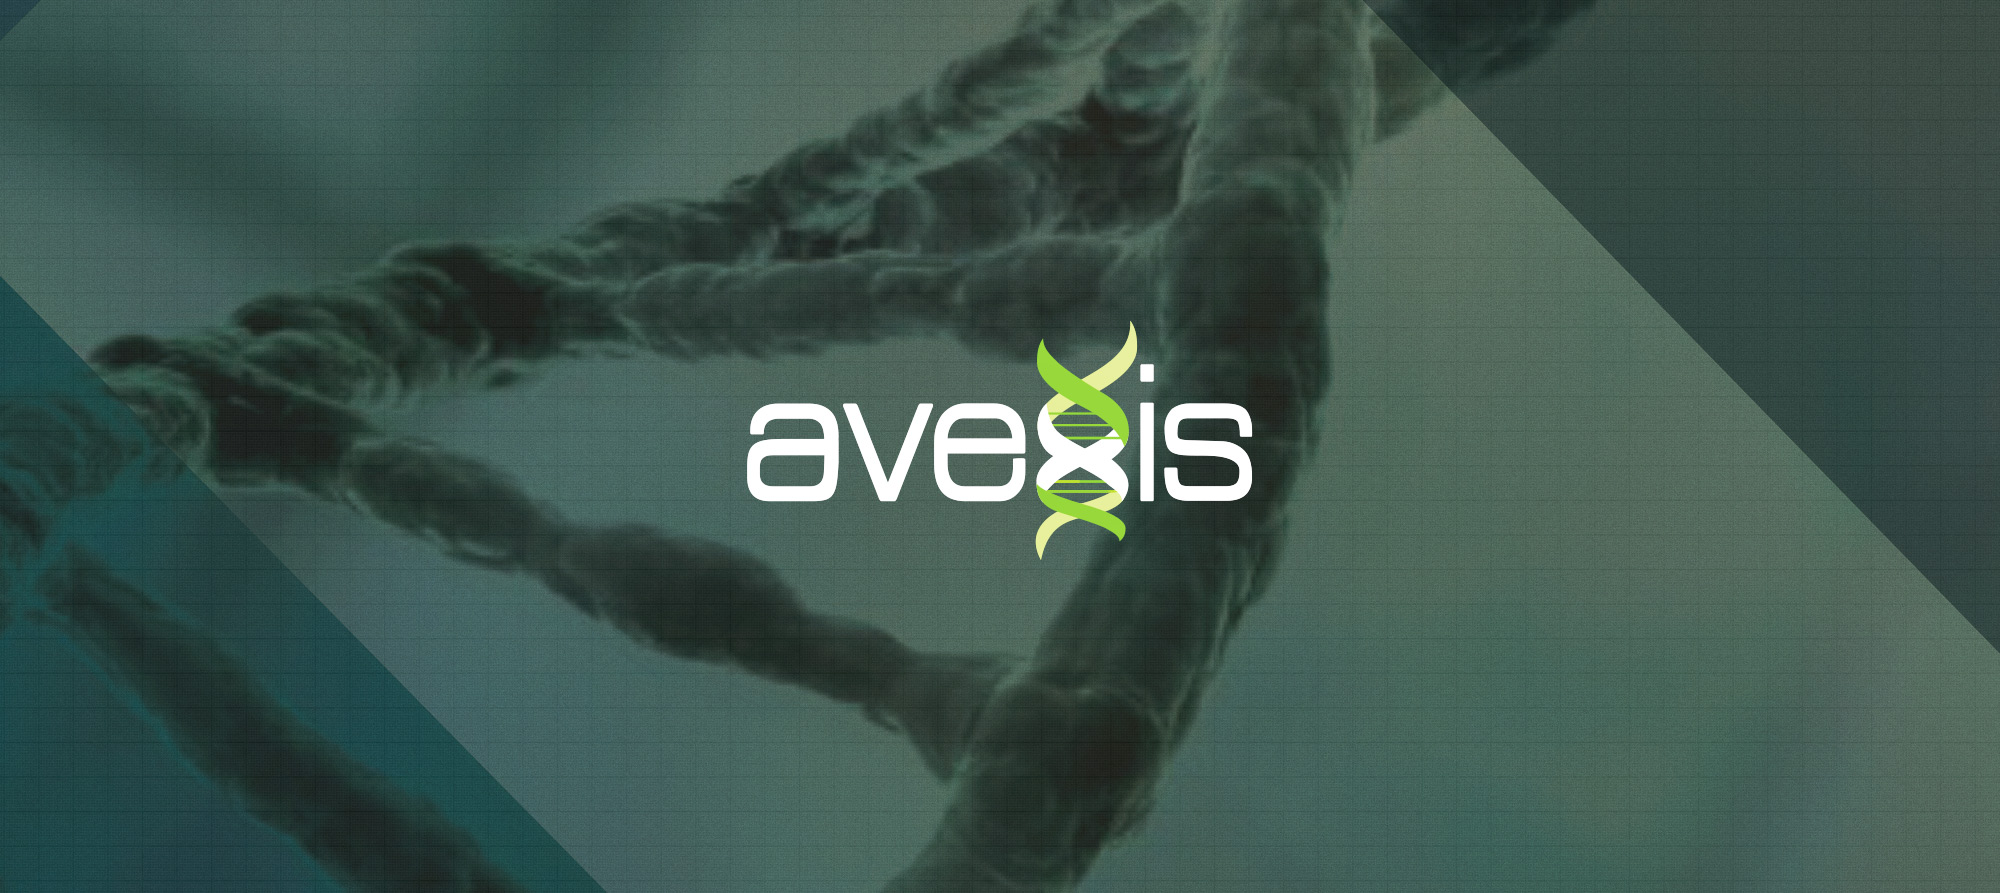 AveXis為基因療法Zolgensma買下新生產工廠 (圖片來源: 網路)